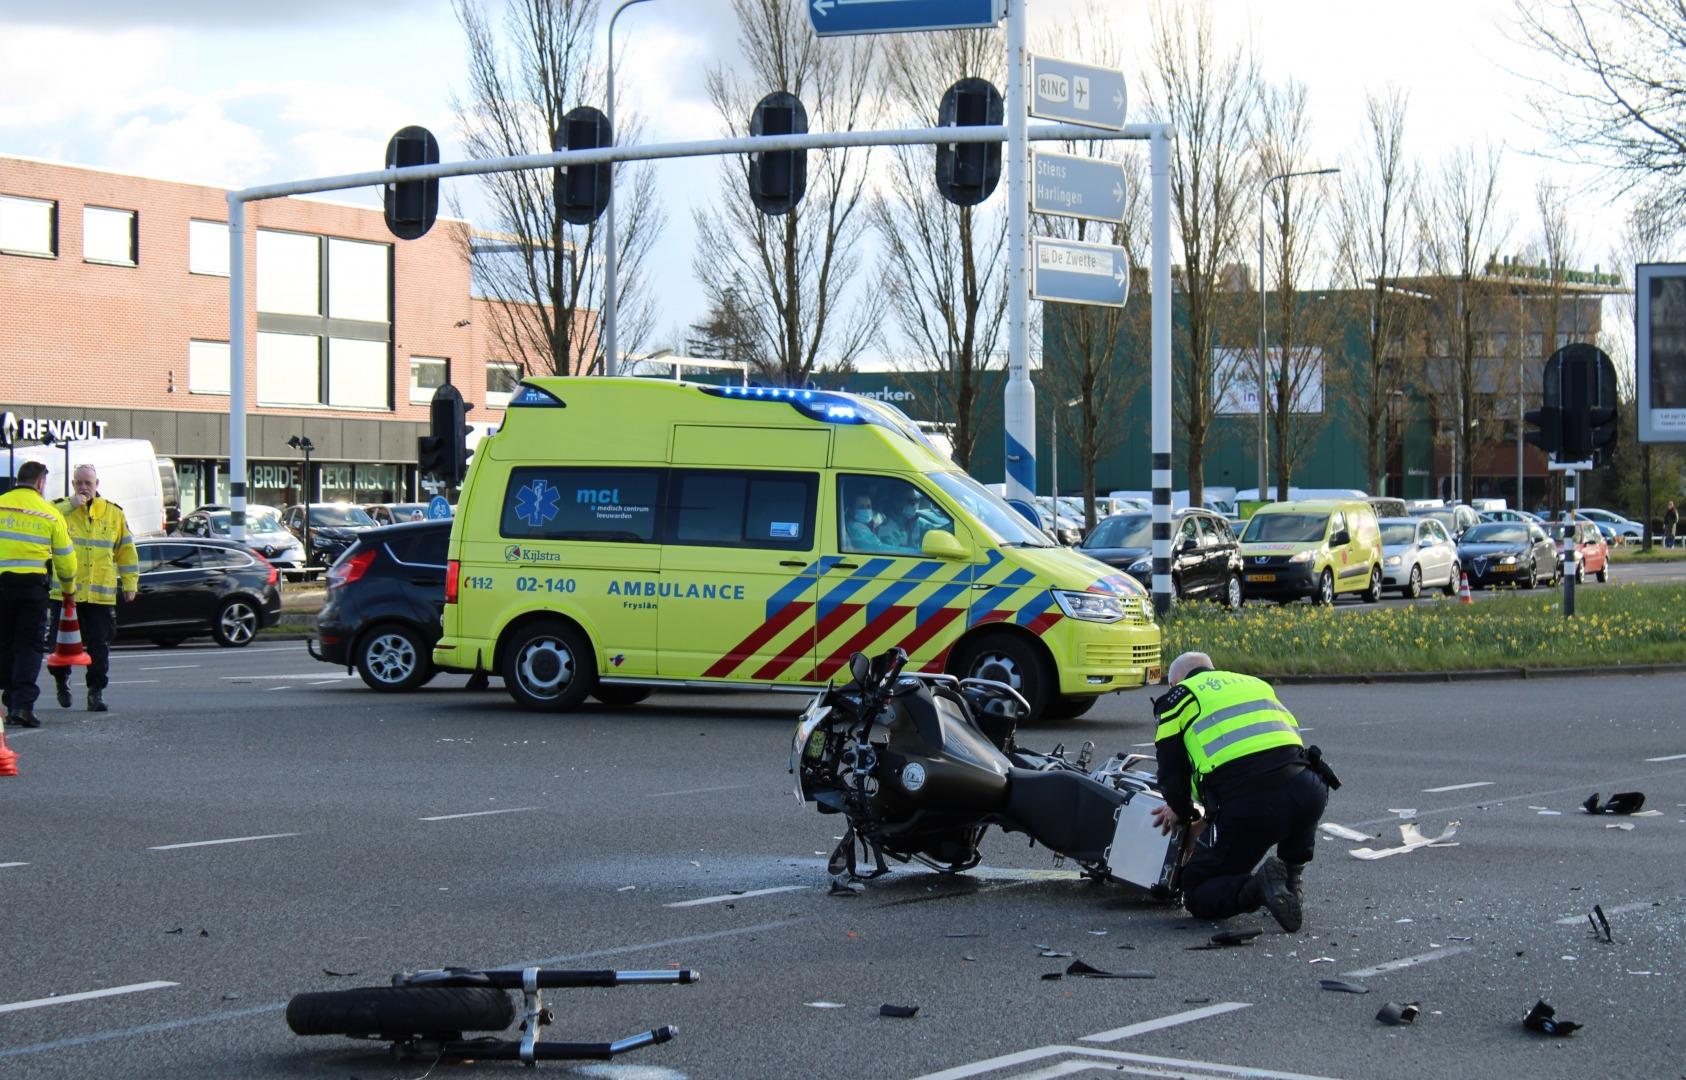 Motorrijder gewond na forse botsing op kruising.